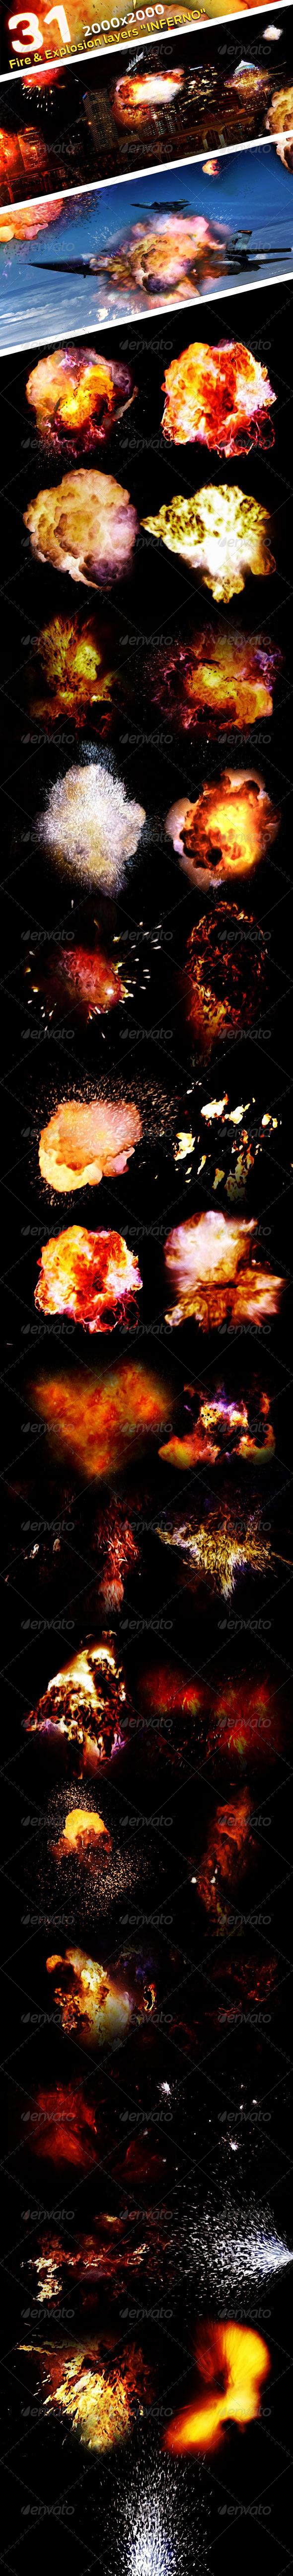 GraphicRiver 31 Fire & Explosion Frames Inferno 2363915